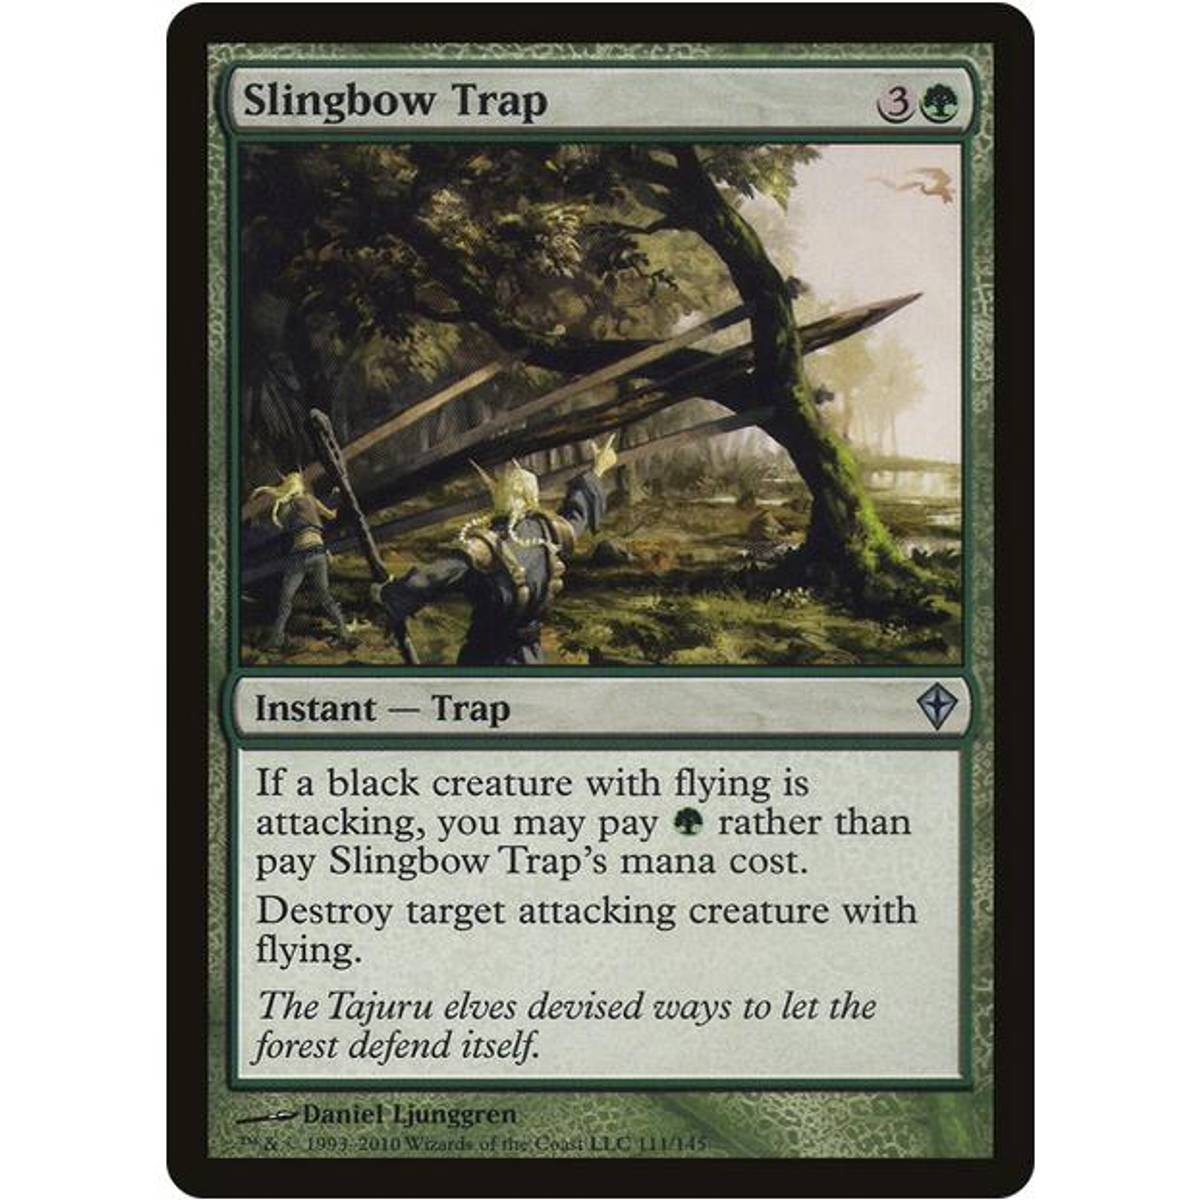 Slingbow Trap